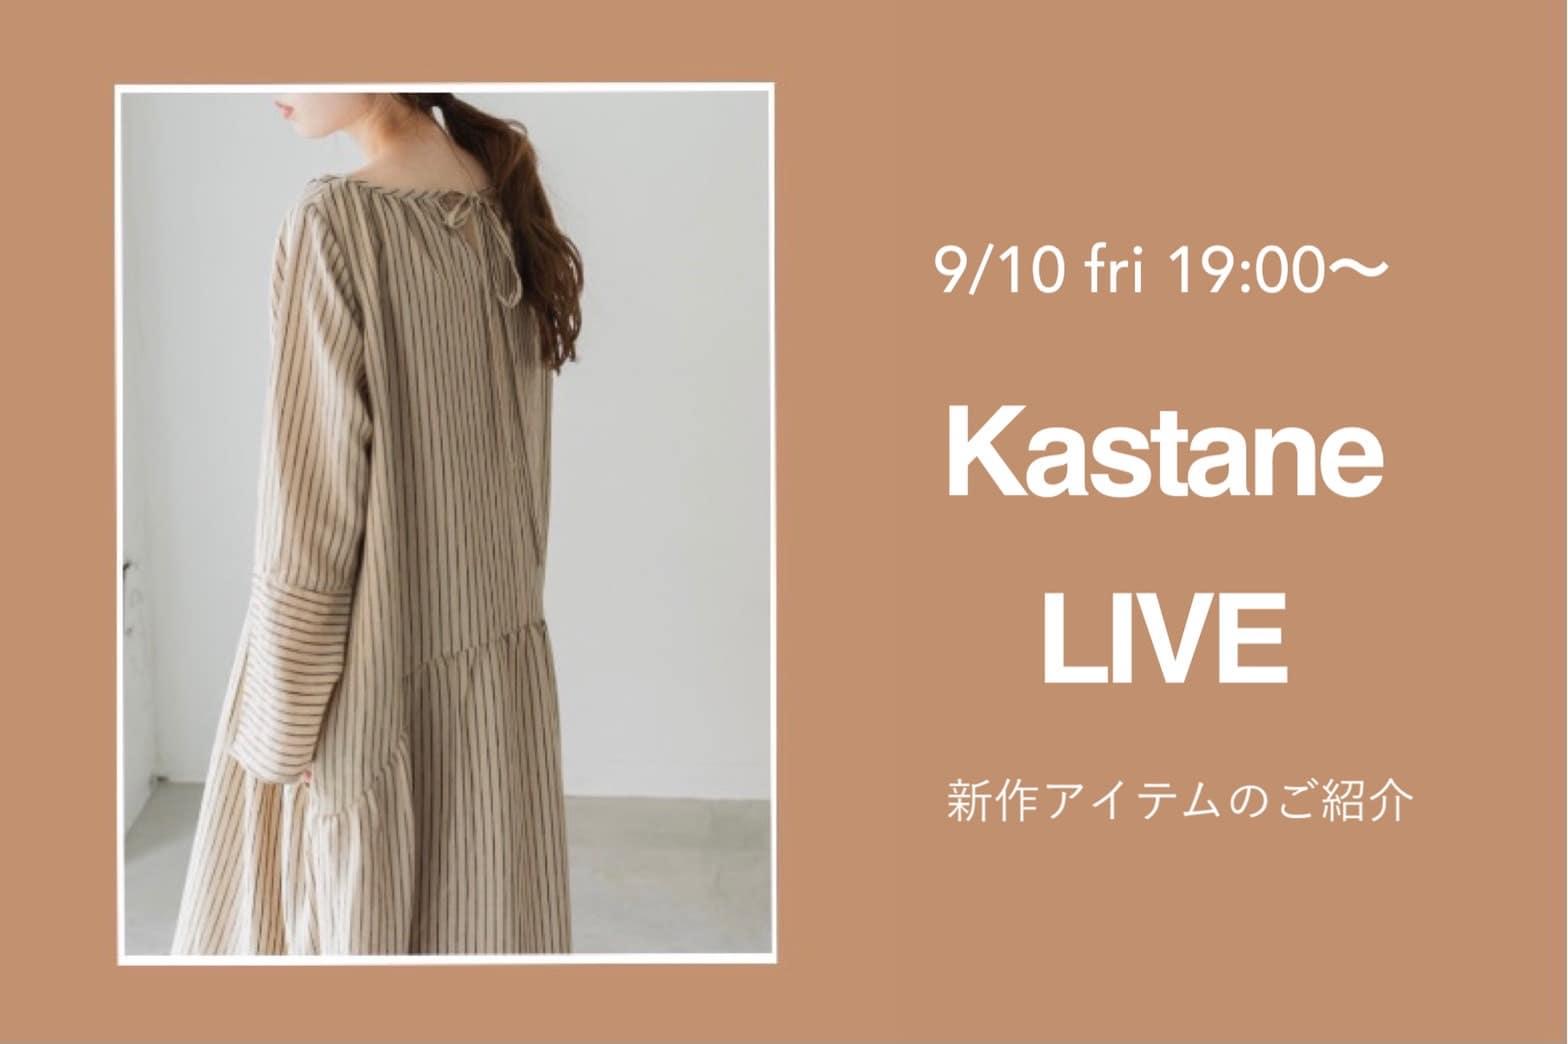 Kastane Kastane LIVE vol.4  9/10(金) 19:00 START!